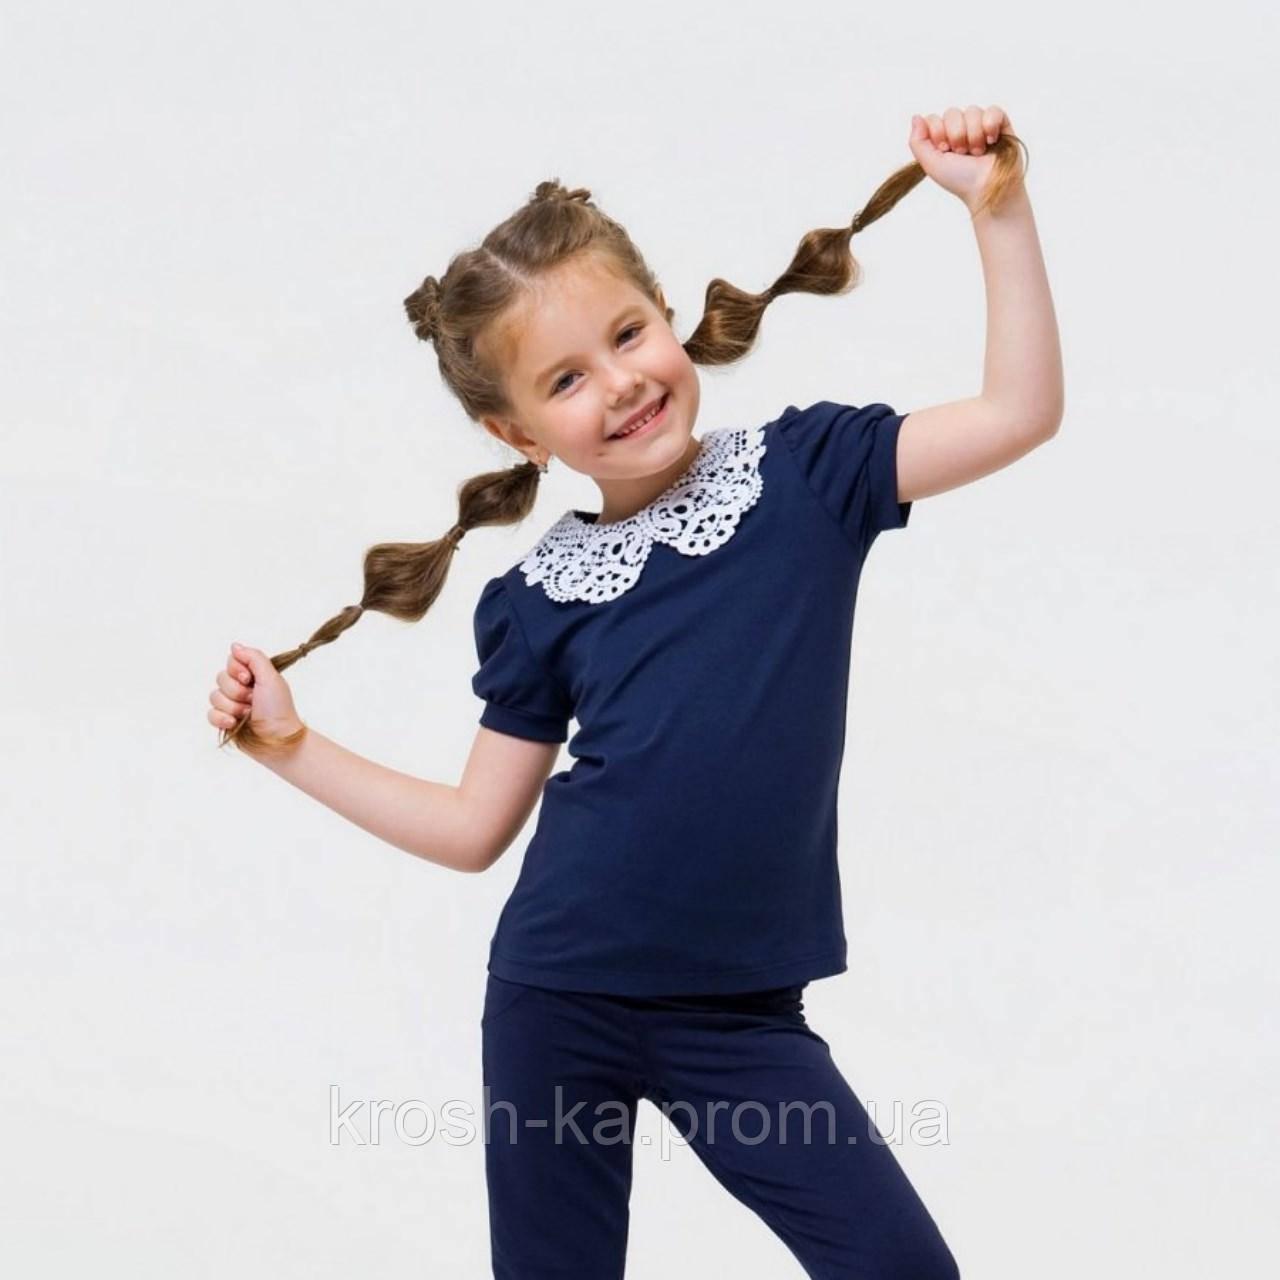 Блуза школьная для девочки короткий рукав синяя (128-140)р Smil(Смил) Украина 114763